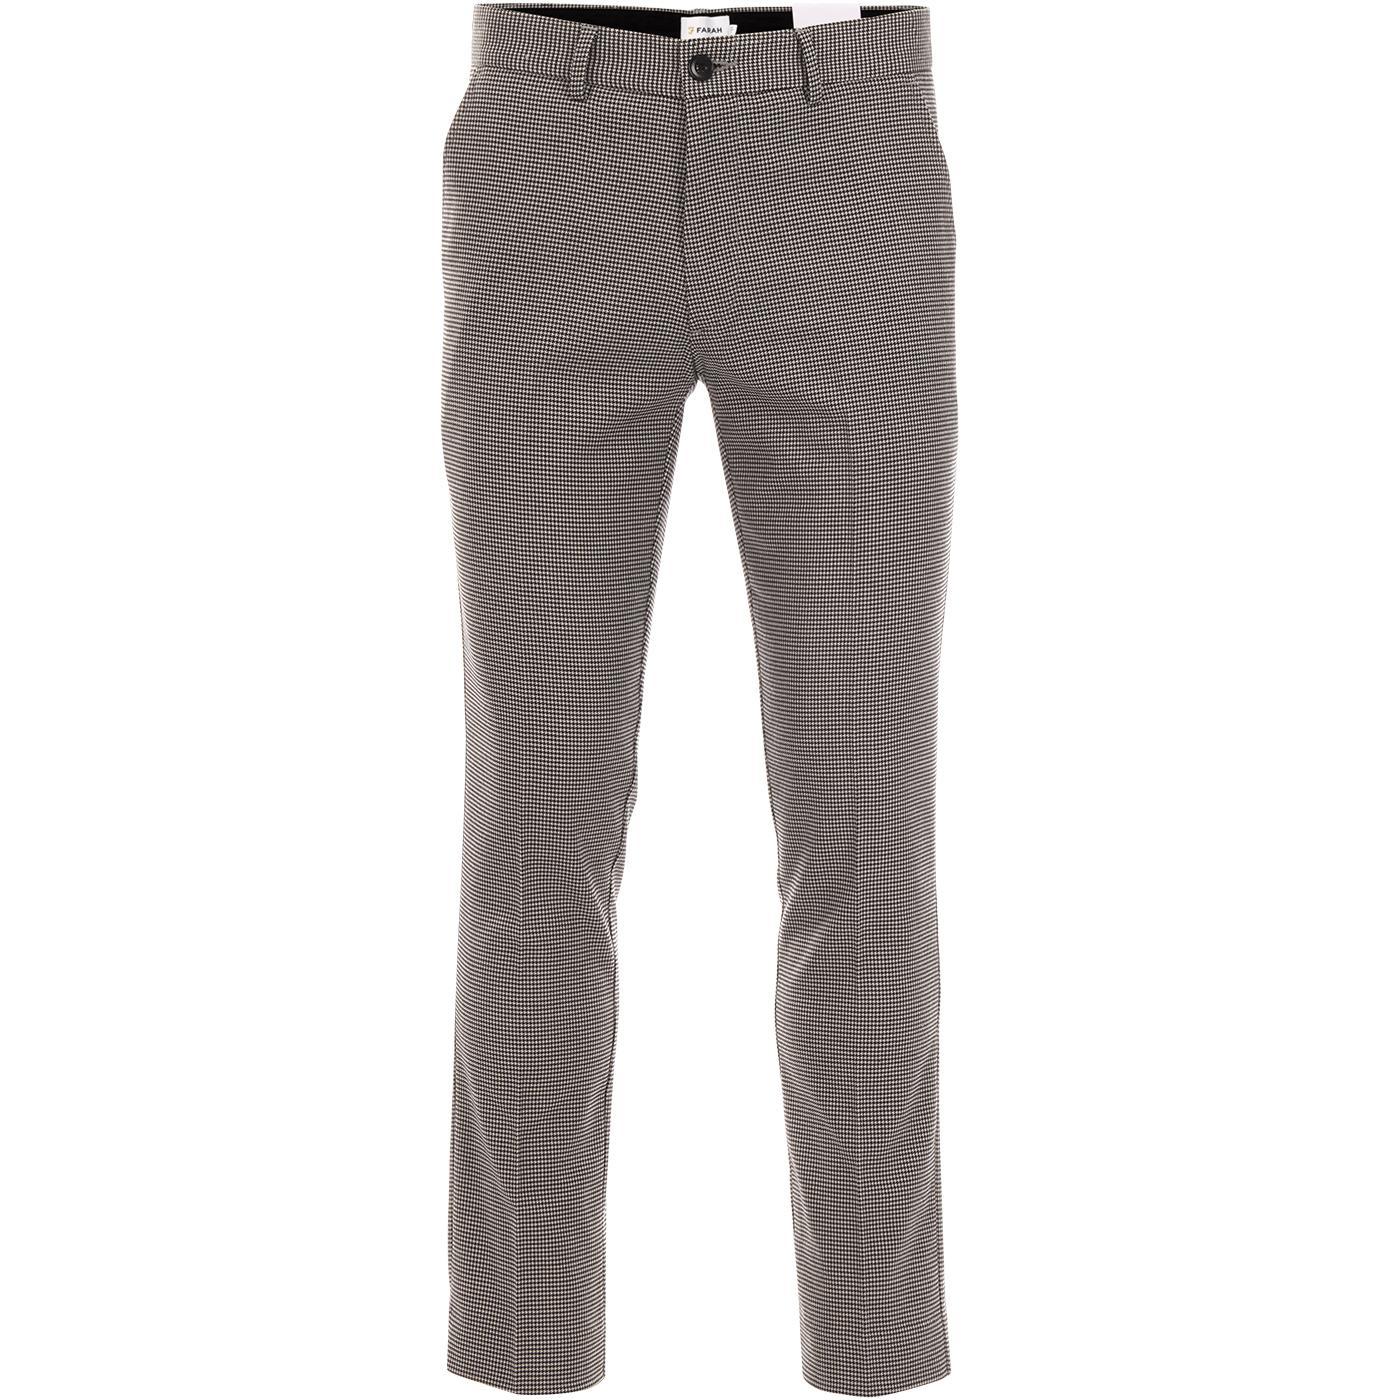 Elm FARAH Men's Retro Slim Leg Puppytooth Trousers